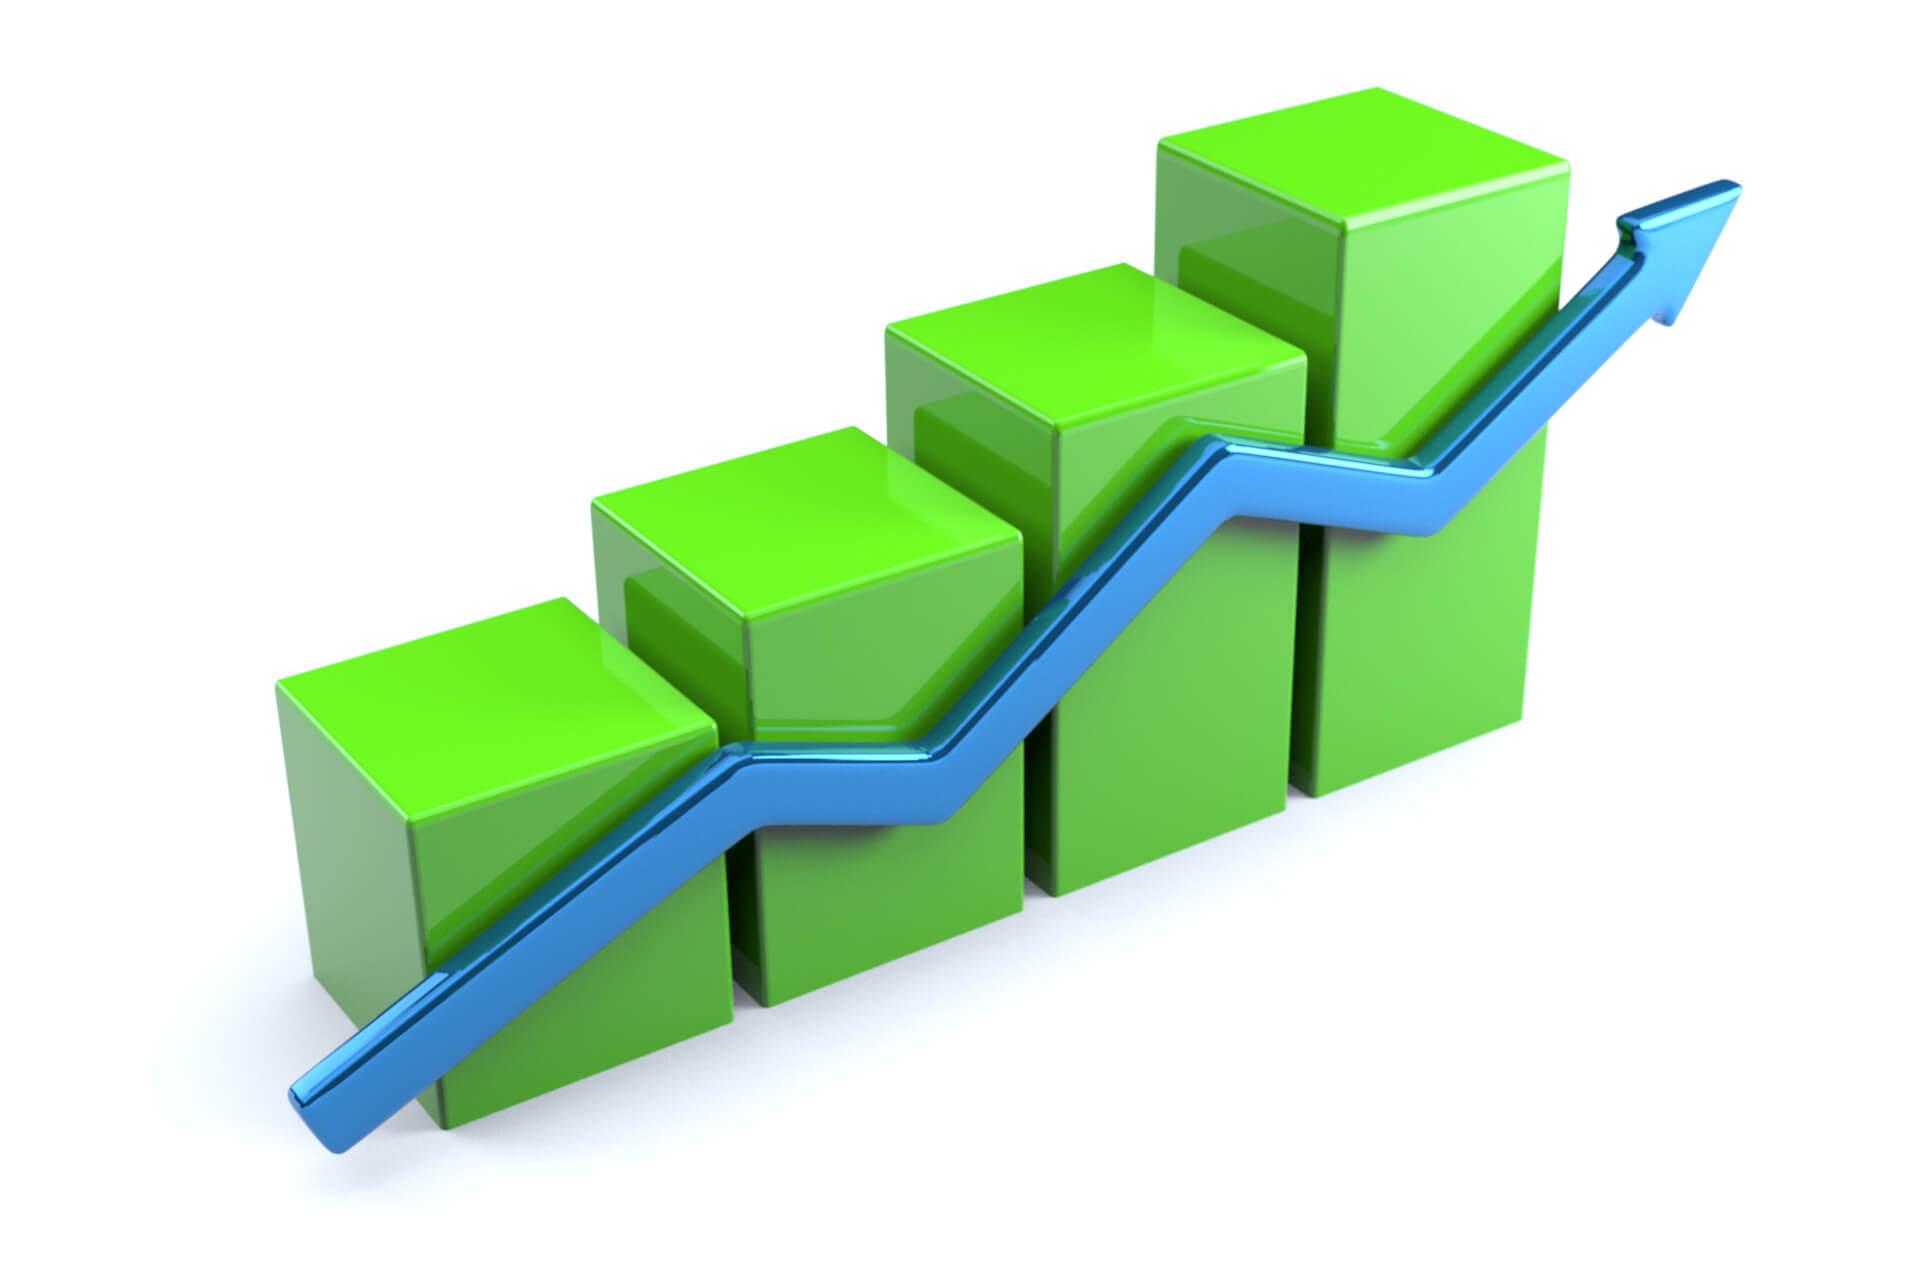 green 3d column chart up arrow free image download